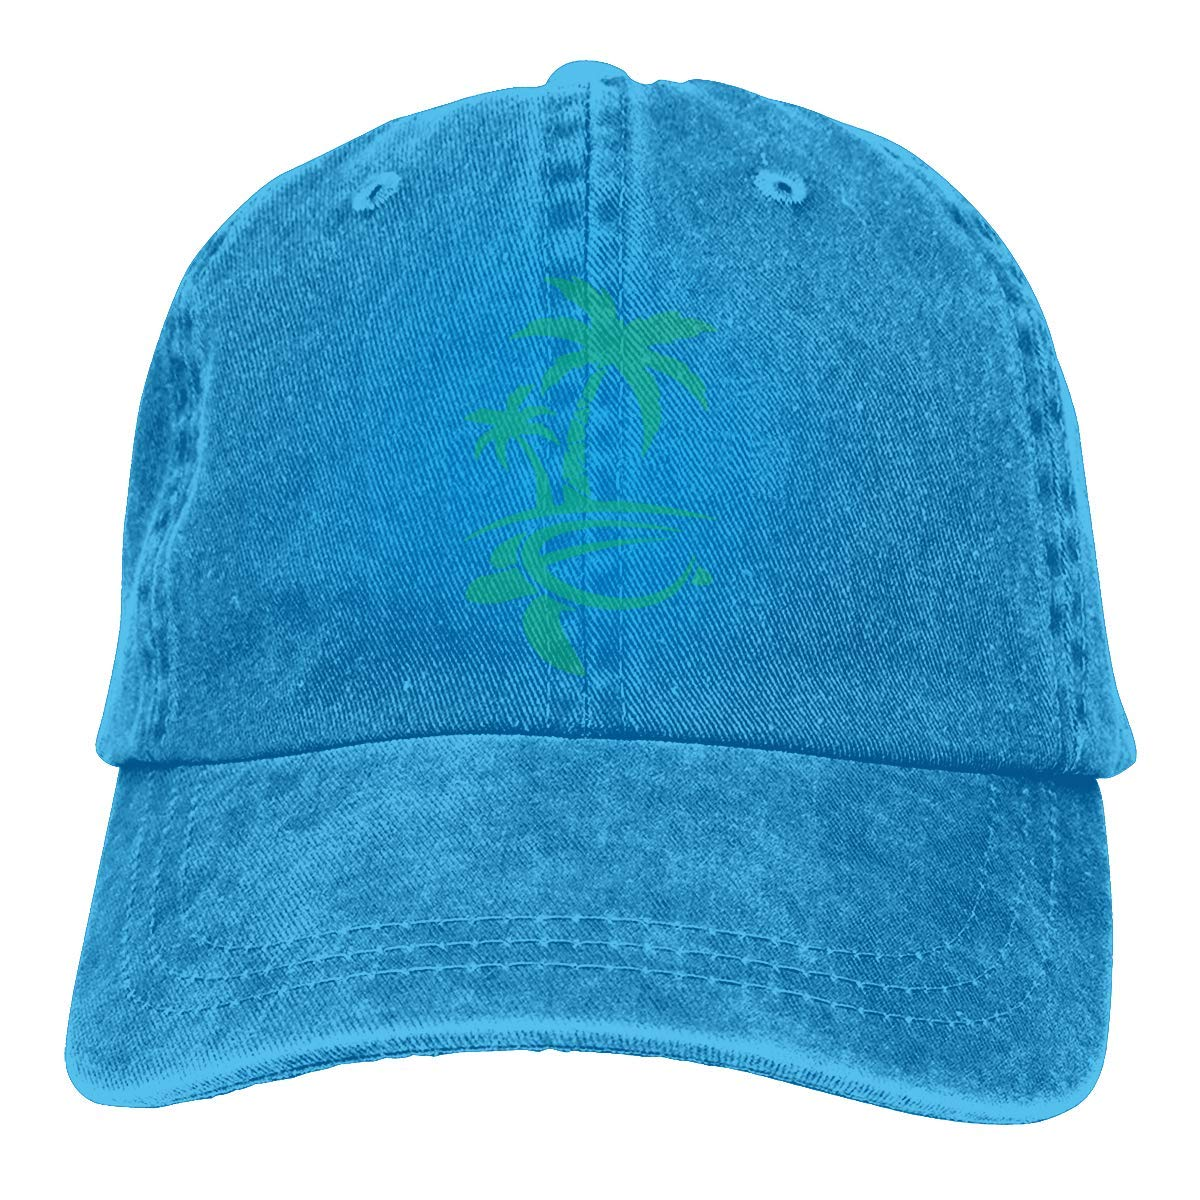 Hawaiian Palm Tree and Sea Turtle Mens Womens Adjustable Denim Baseball Cap Trucker Hat